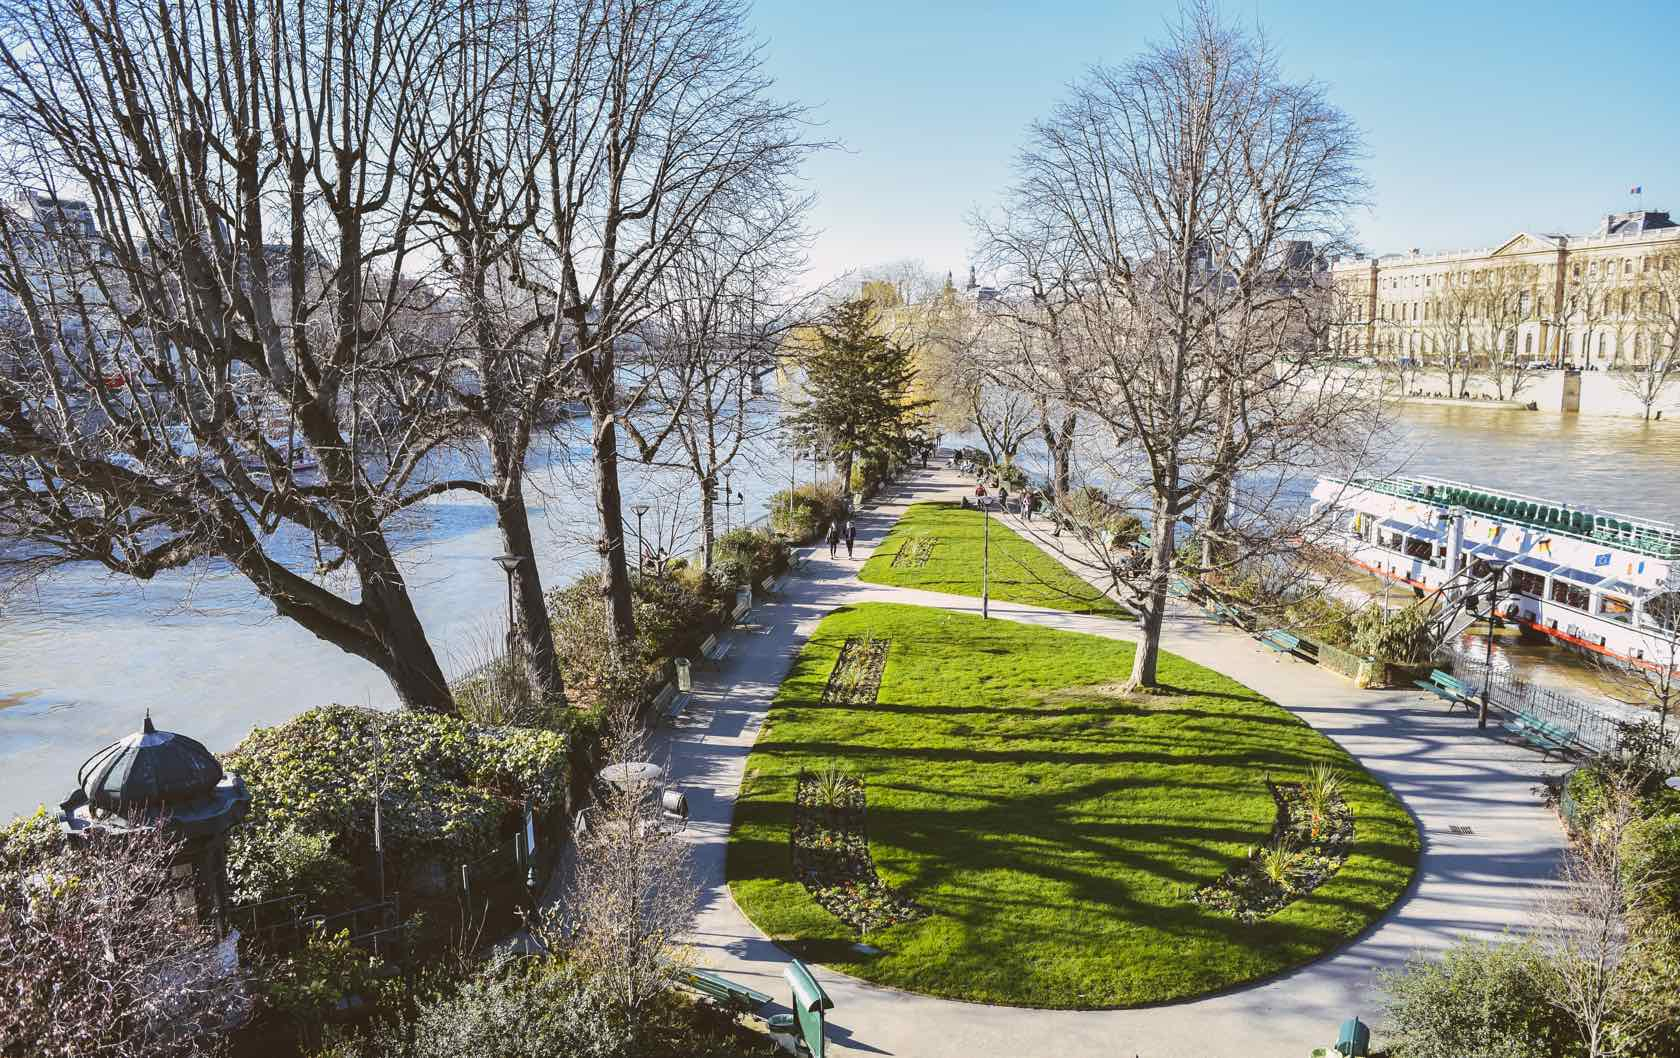 10 of the Best Places to Picnic in Paris by Paris Perfect Square du Vert-Galant